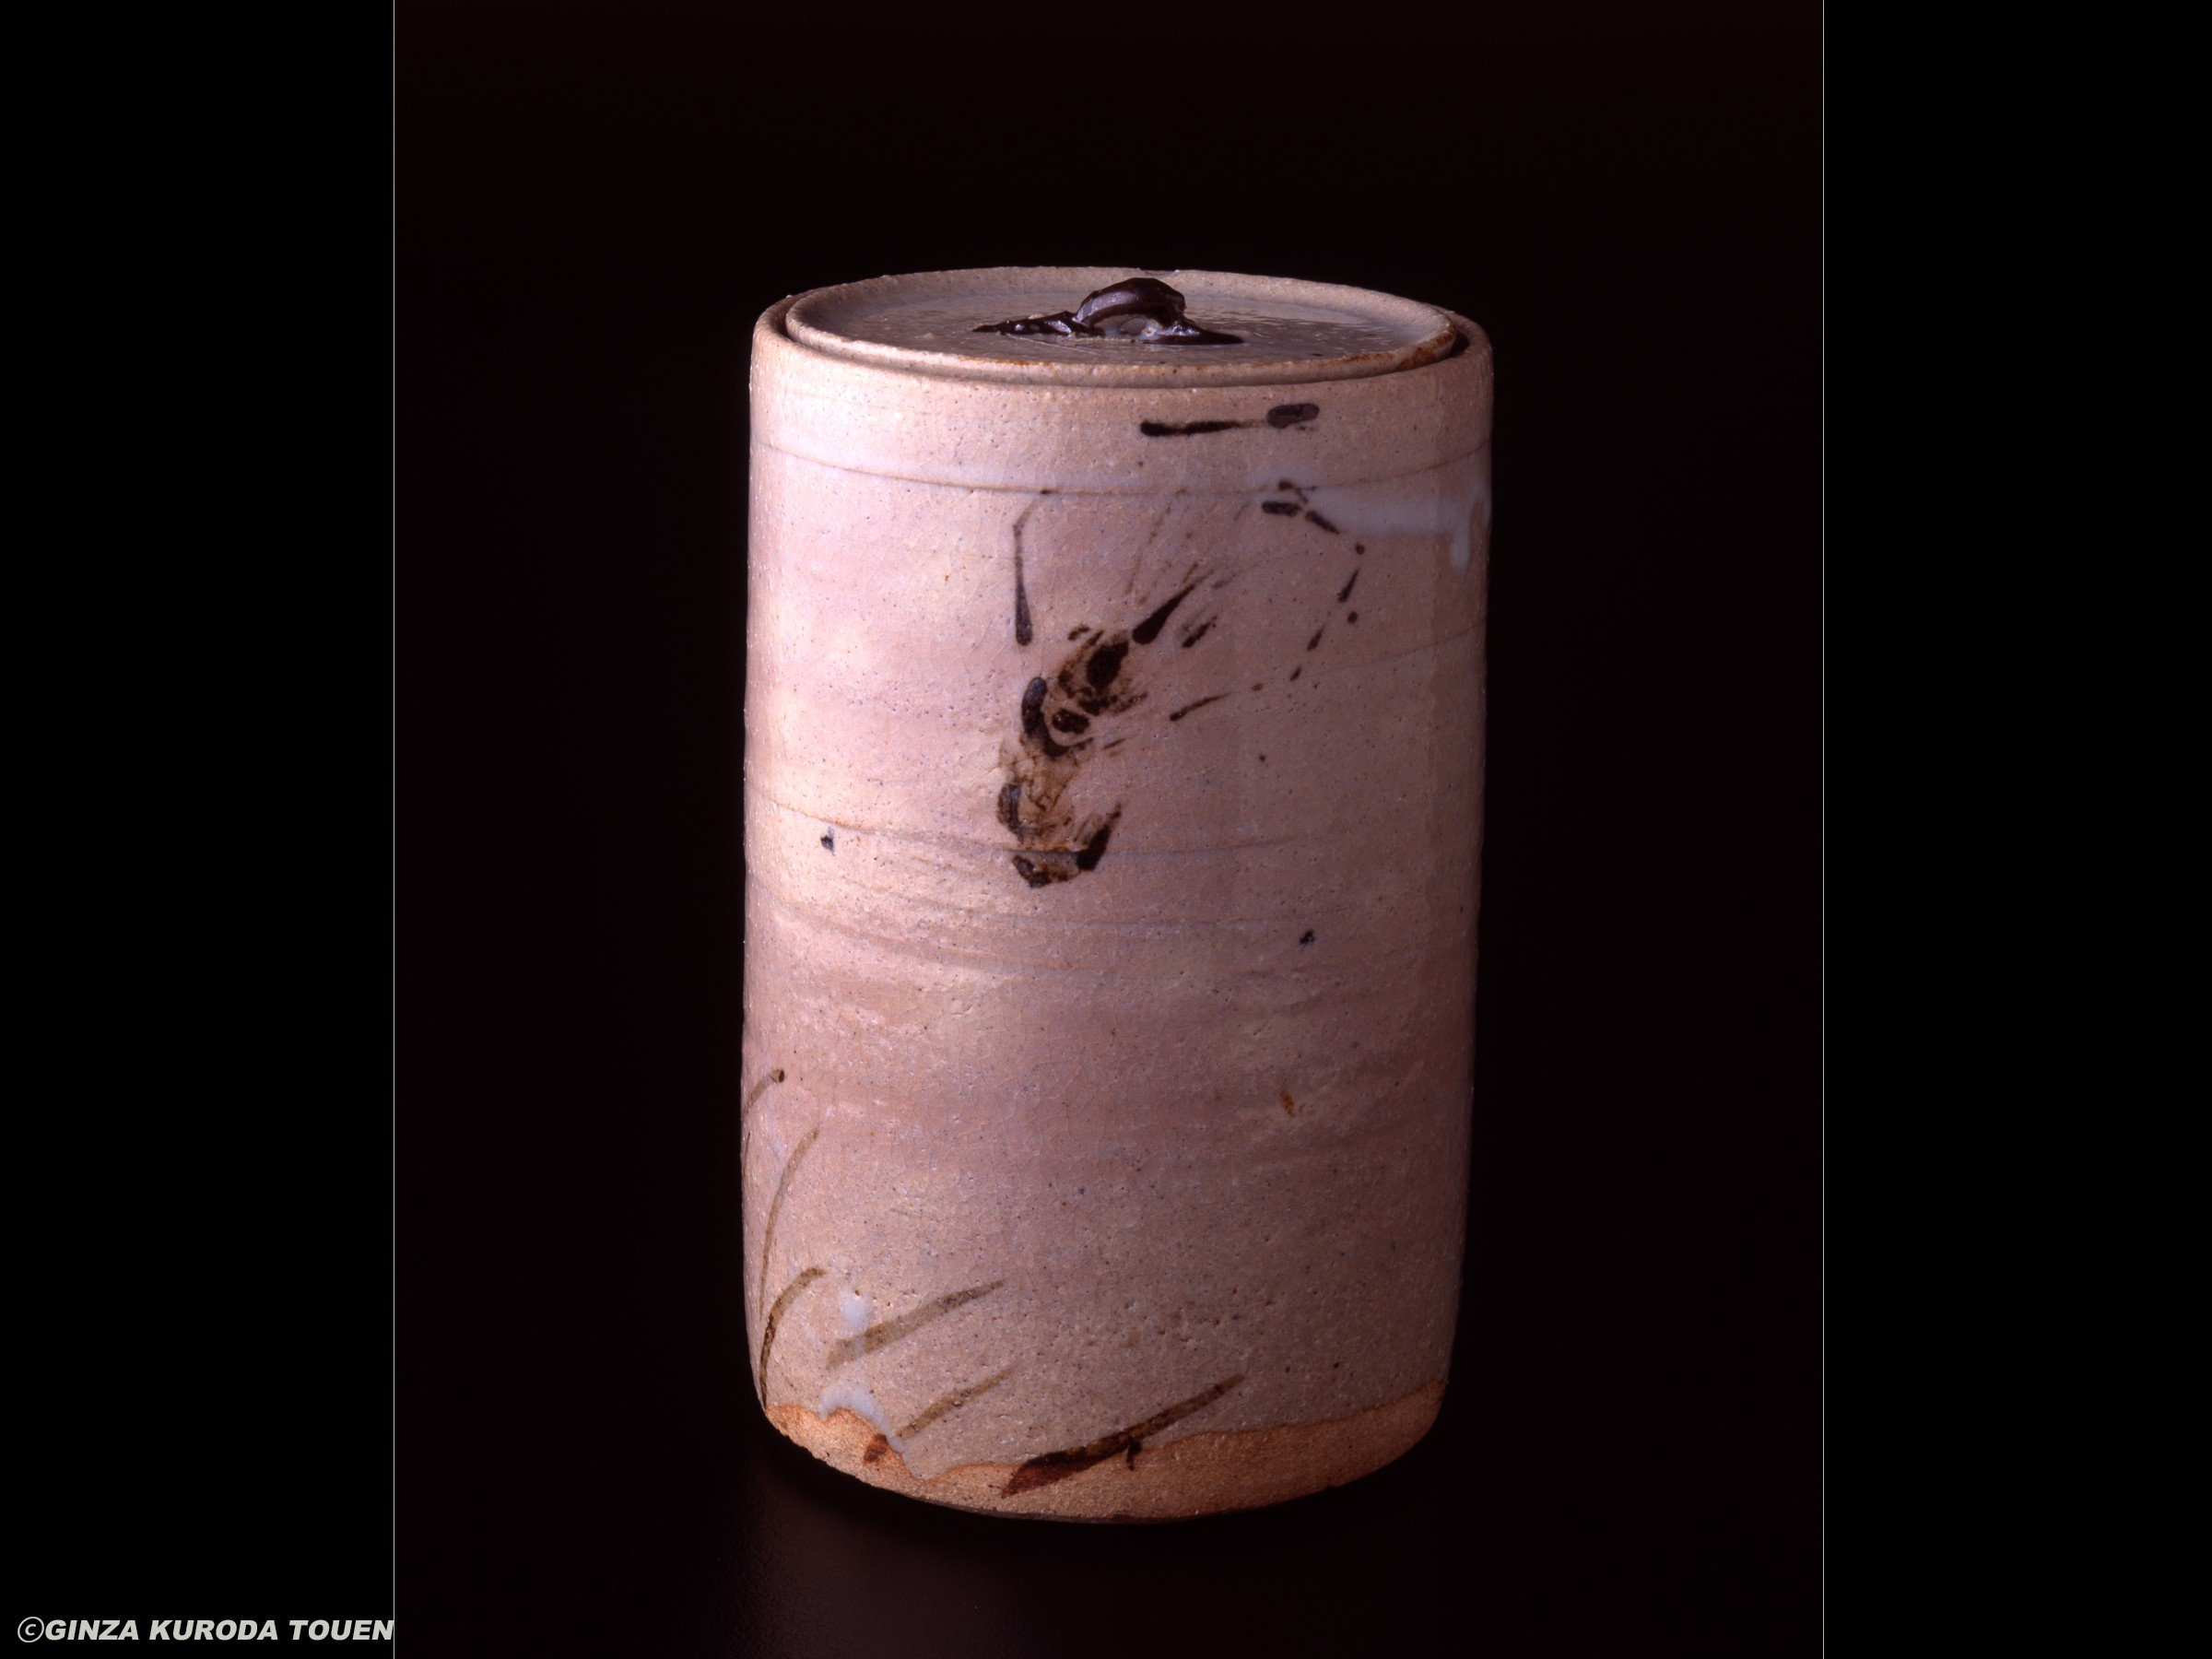 Rosanjin Kitaoji: Water jag (Mizusashi)